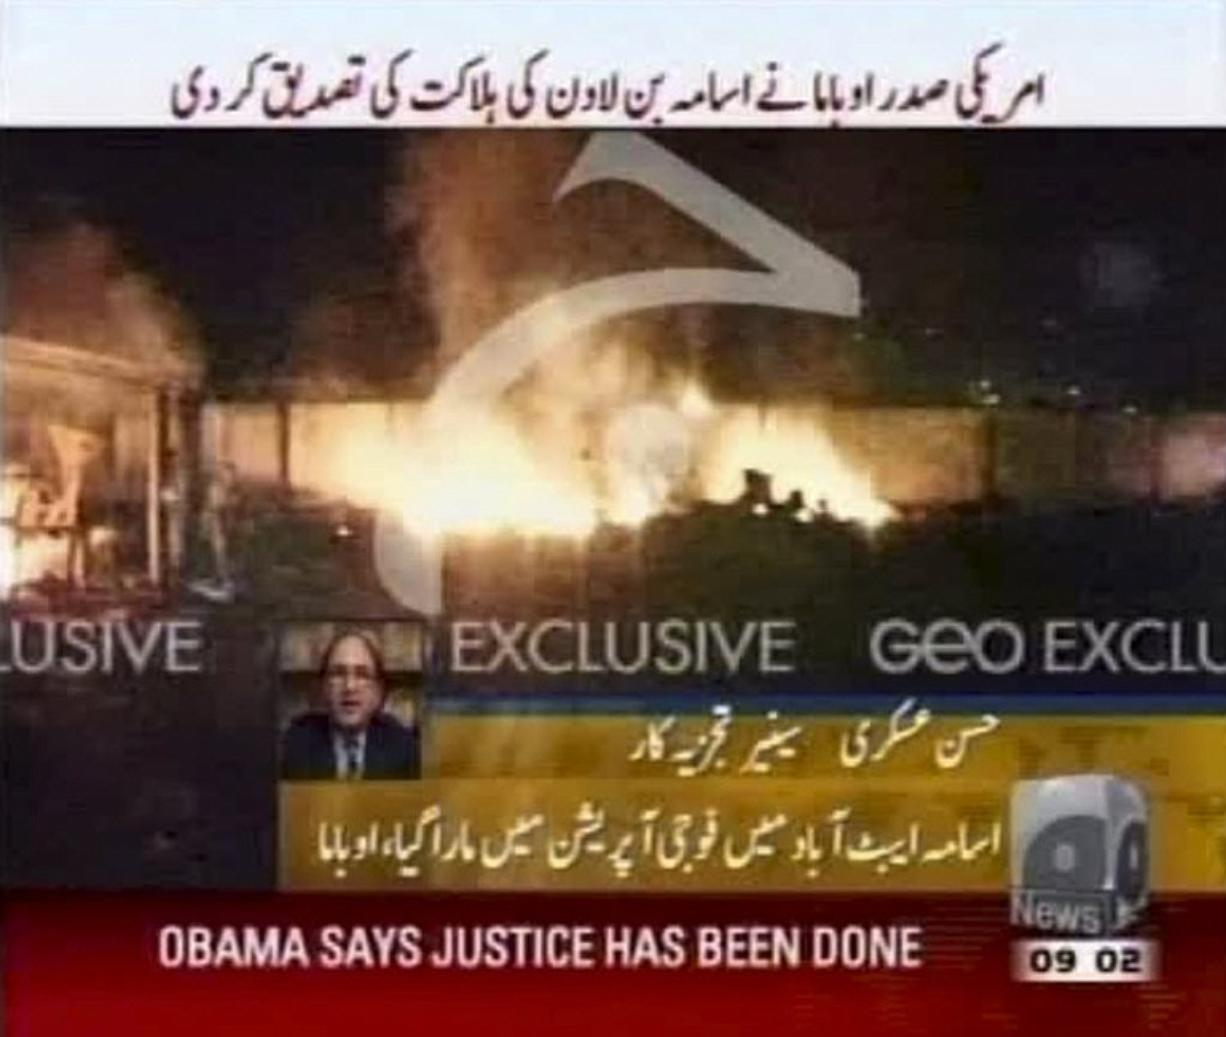 Word from Pakistan on how bin Laden died - Columbian com